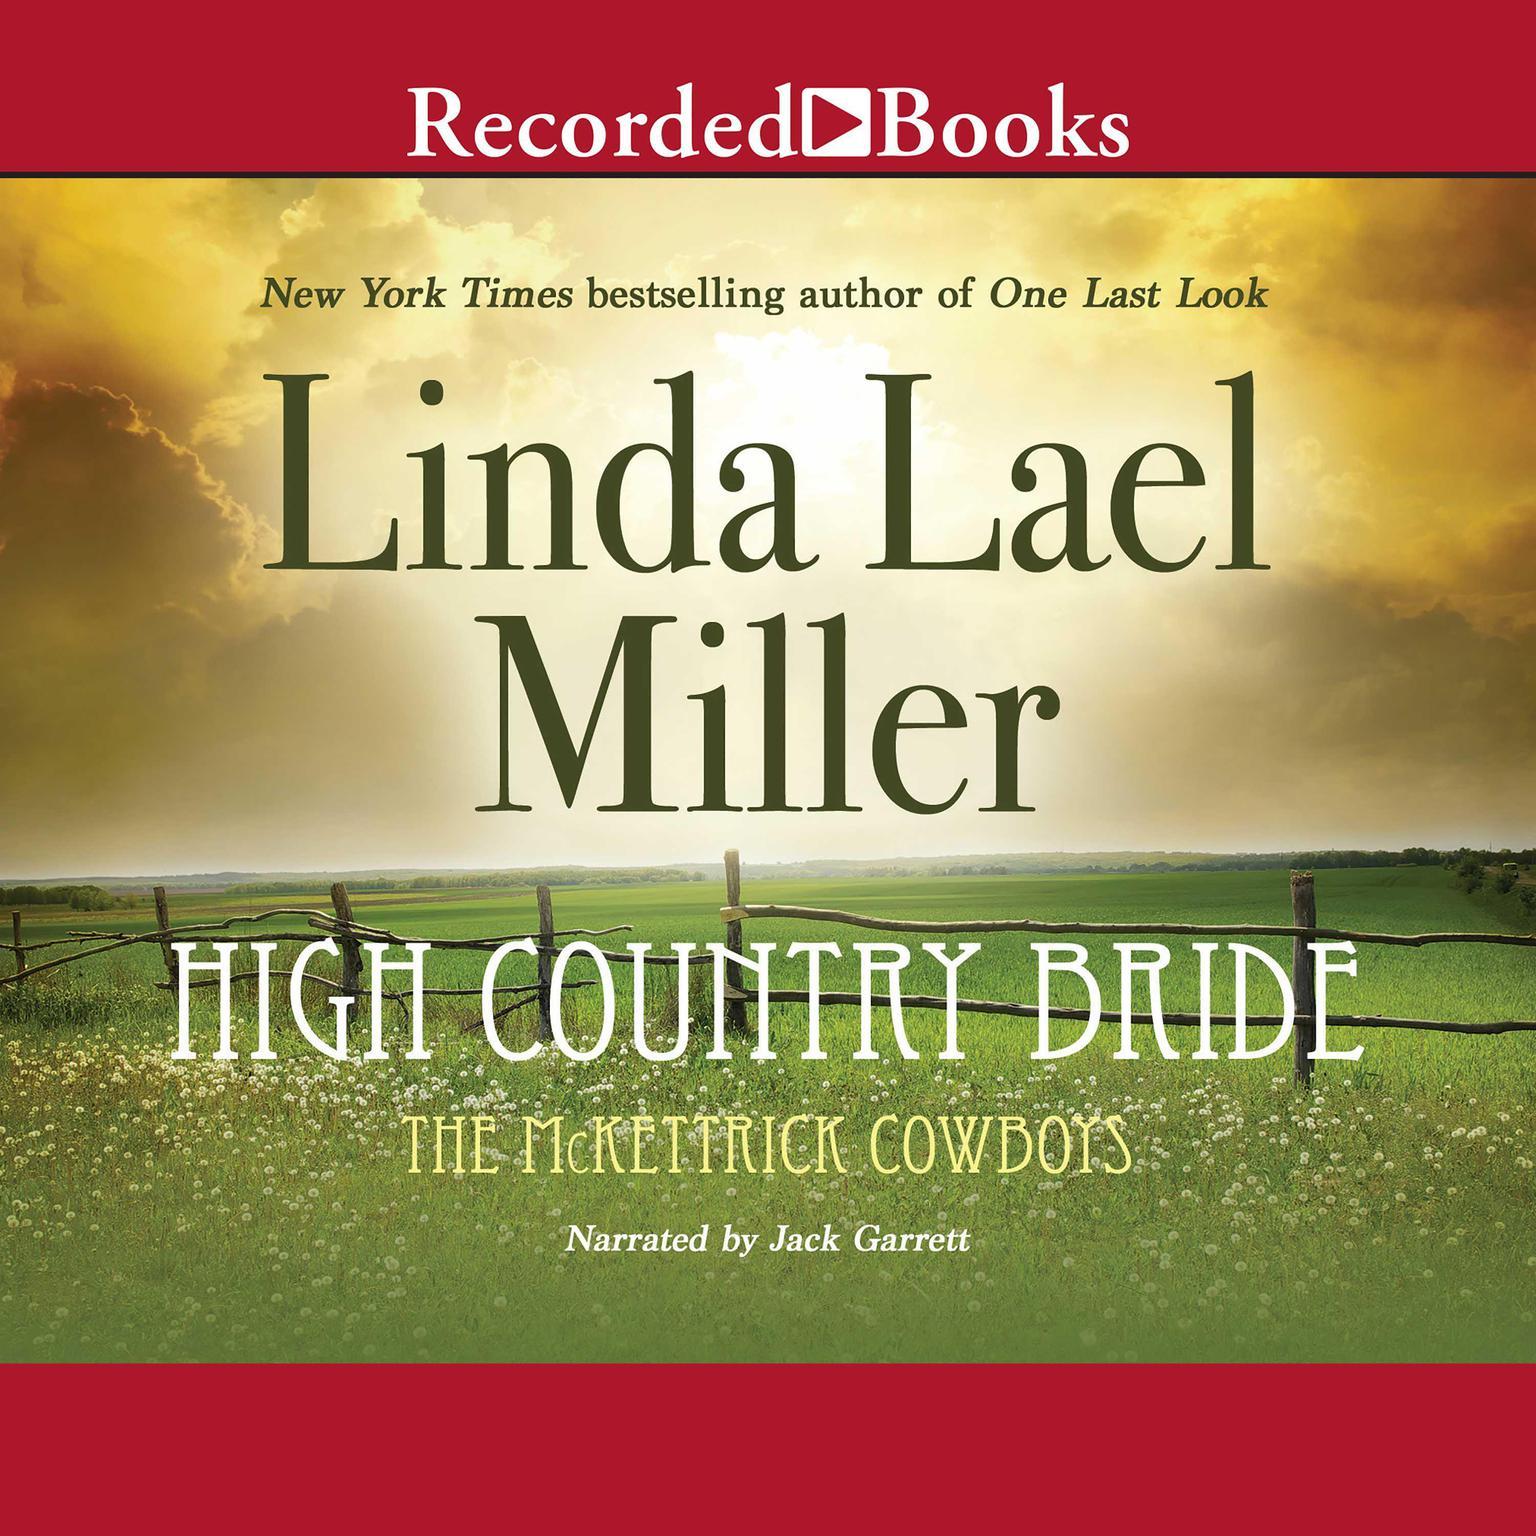 High Country Bride Audiobook, by Linda Lael Miller